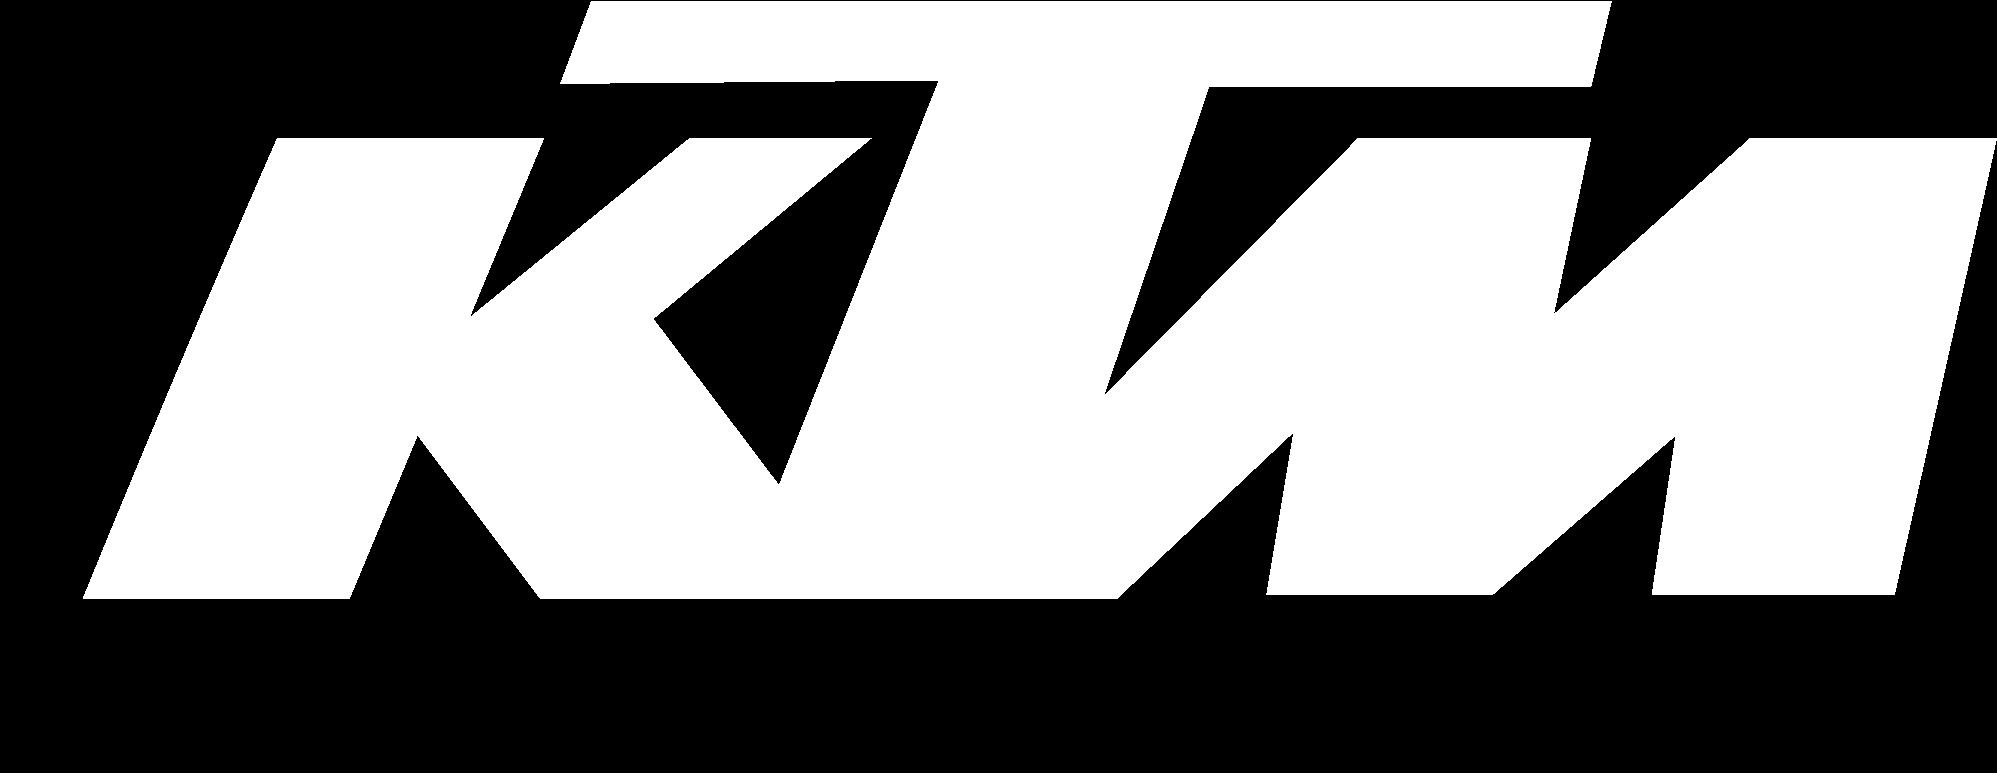 Download Ktm Racing Logo Black And White - Ktm Logo Png White Pluspng.com  - Ktm Racing Logo PNG